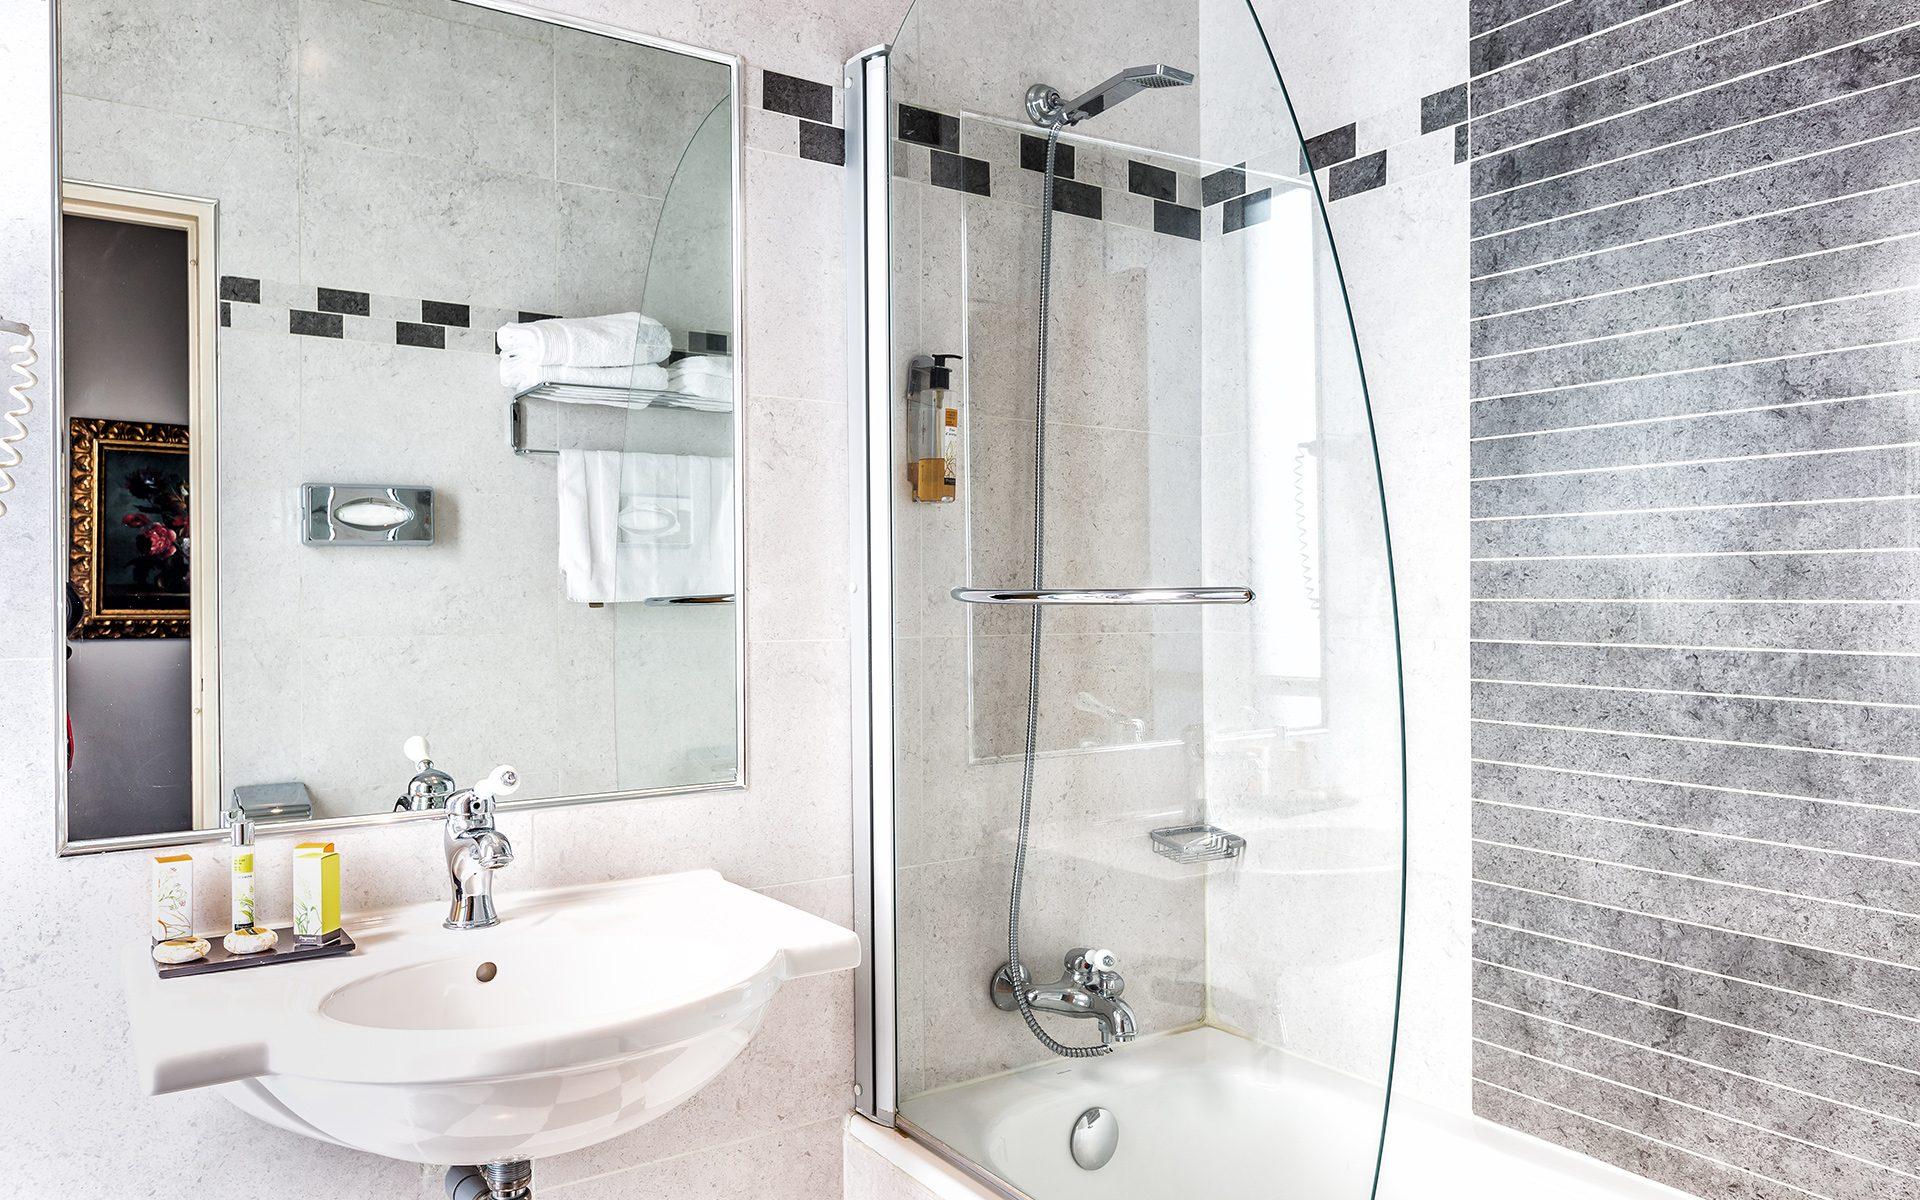 Hotel-Regence_Chambre302-sdb-5535-min